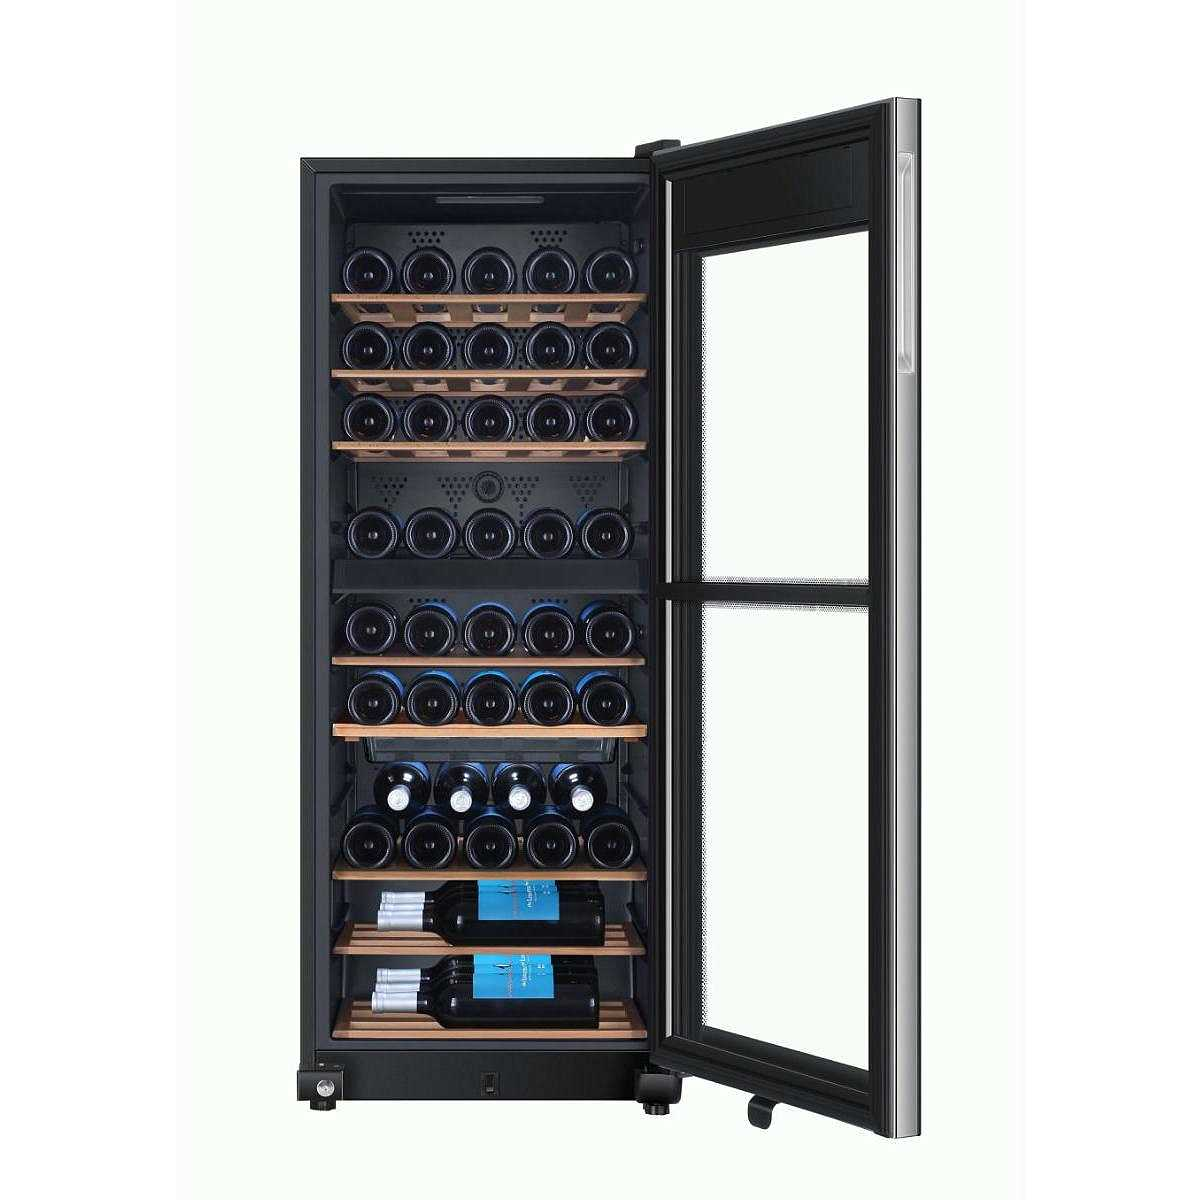 Haier WS53GDA frigo cantina Double Zone 53 bottiglie classe ...